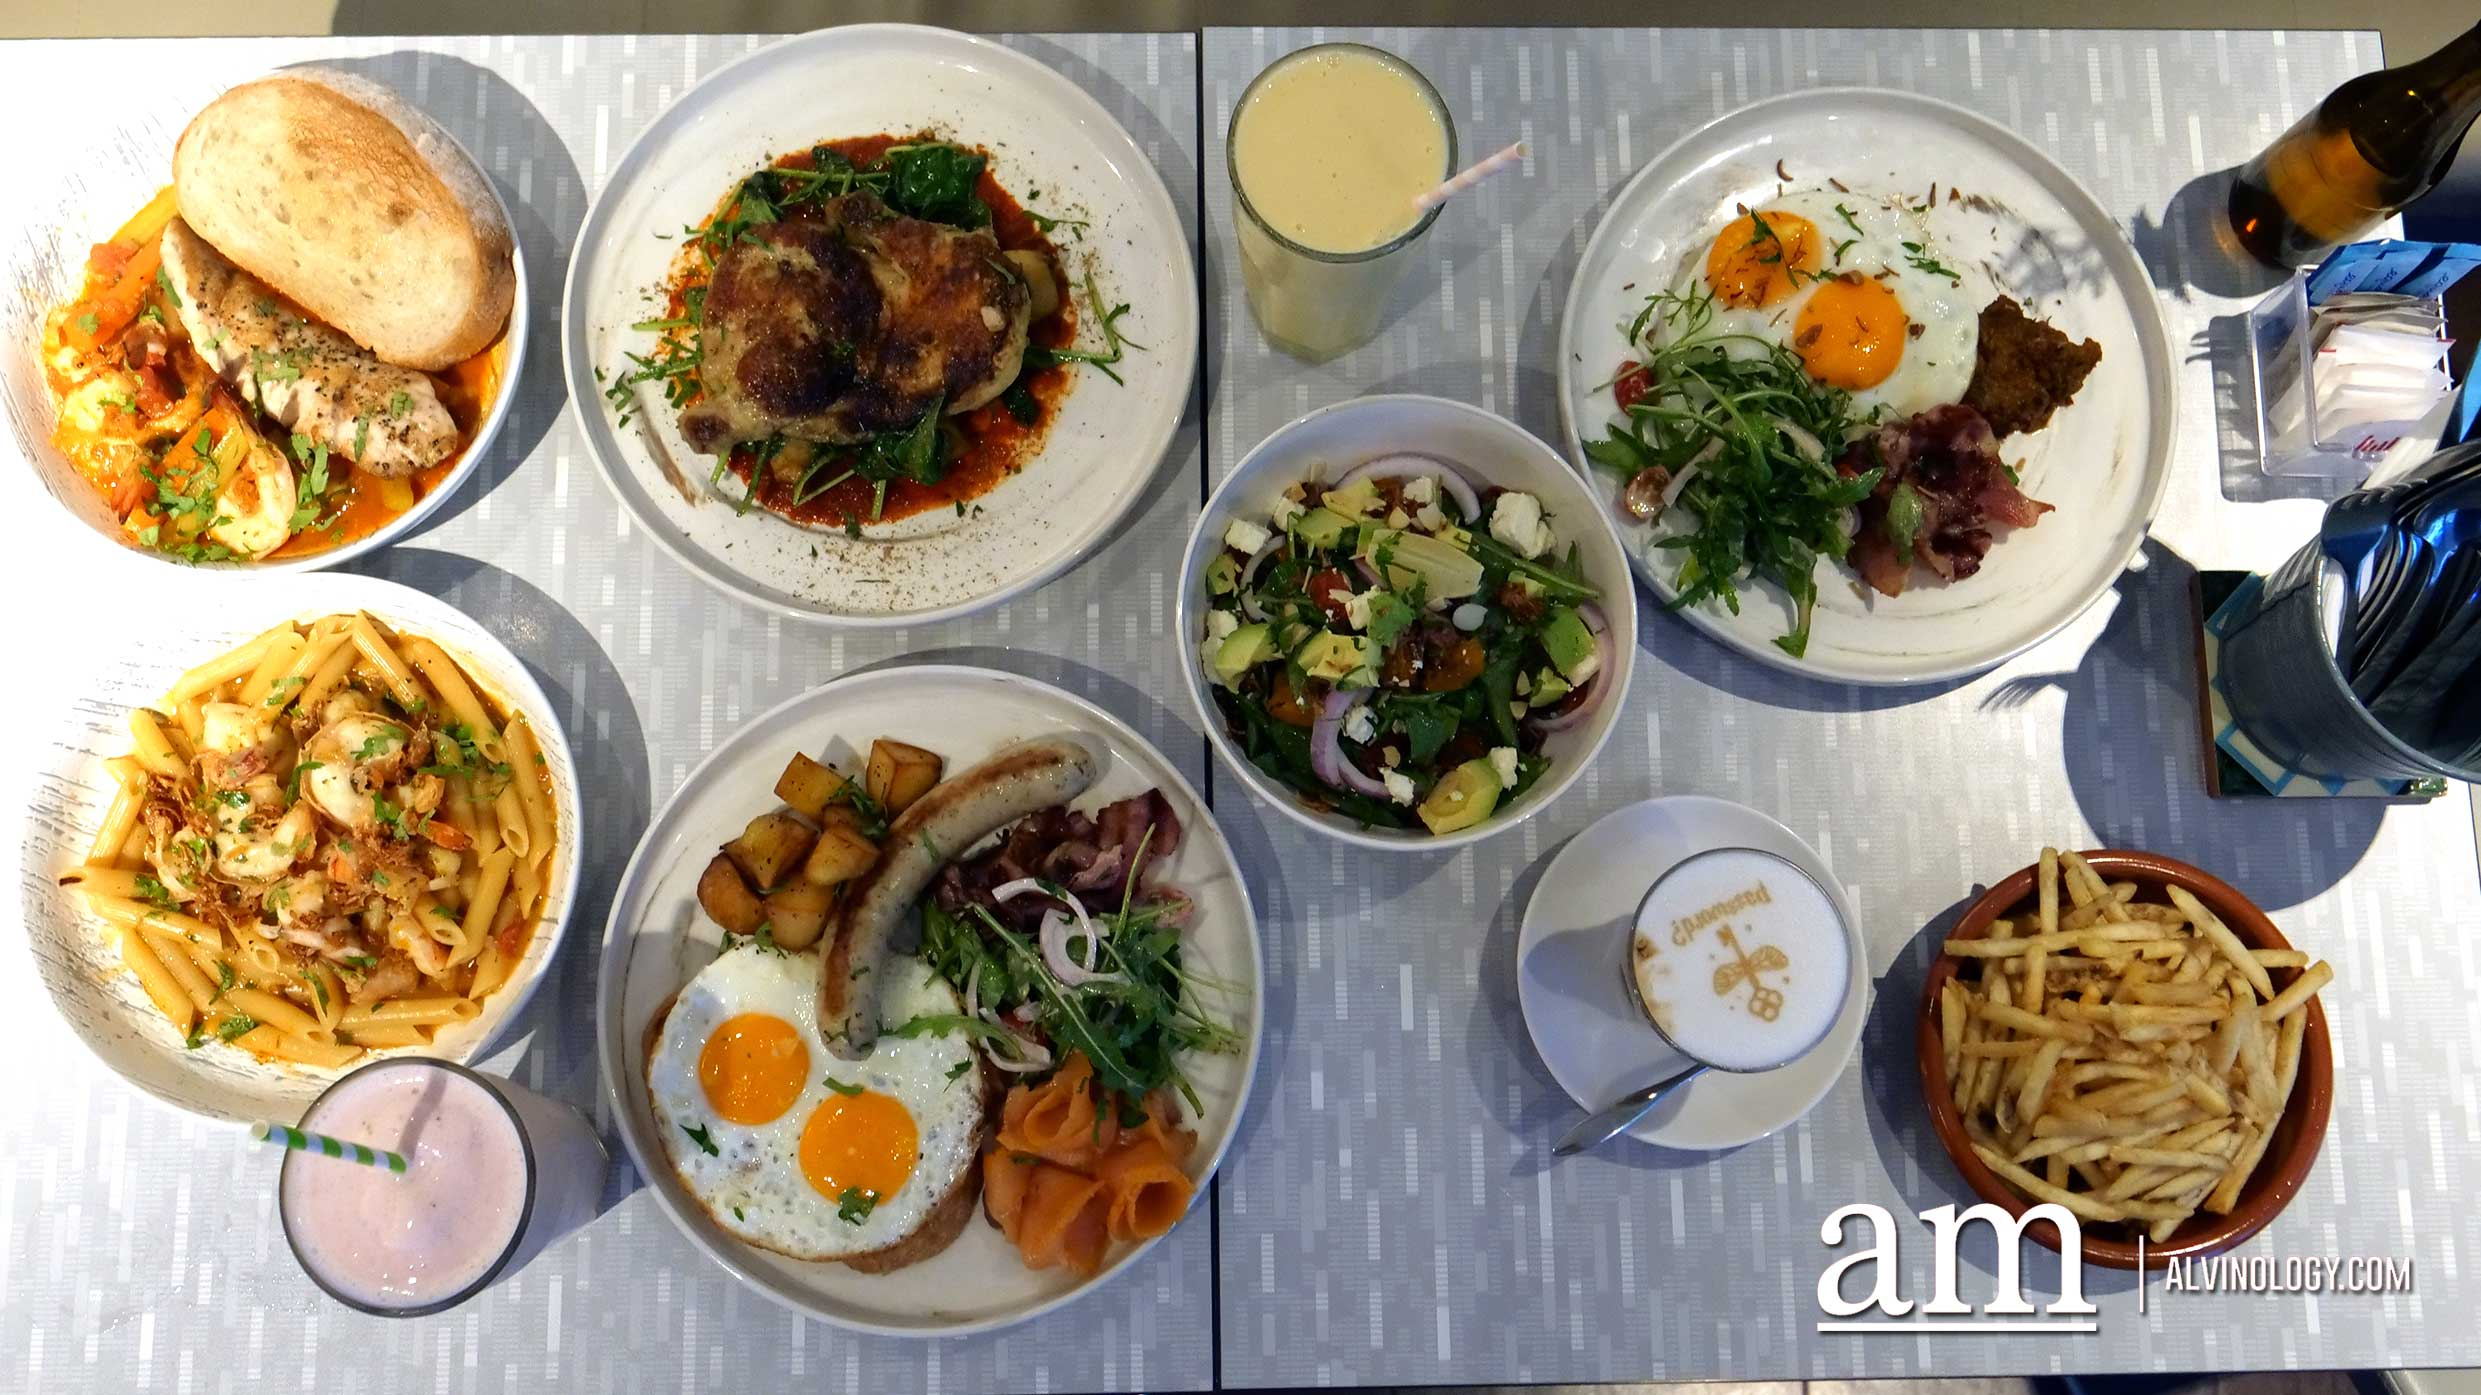 The full feast